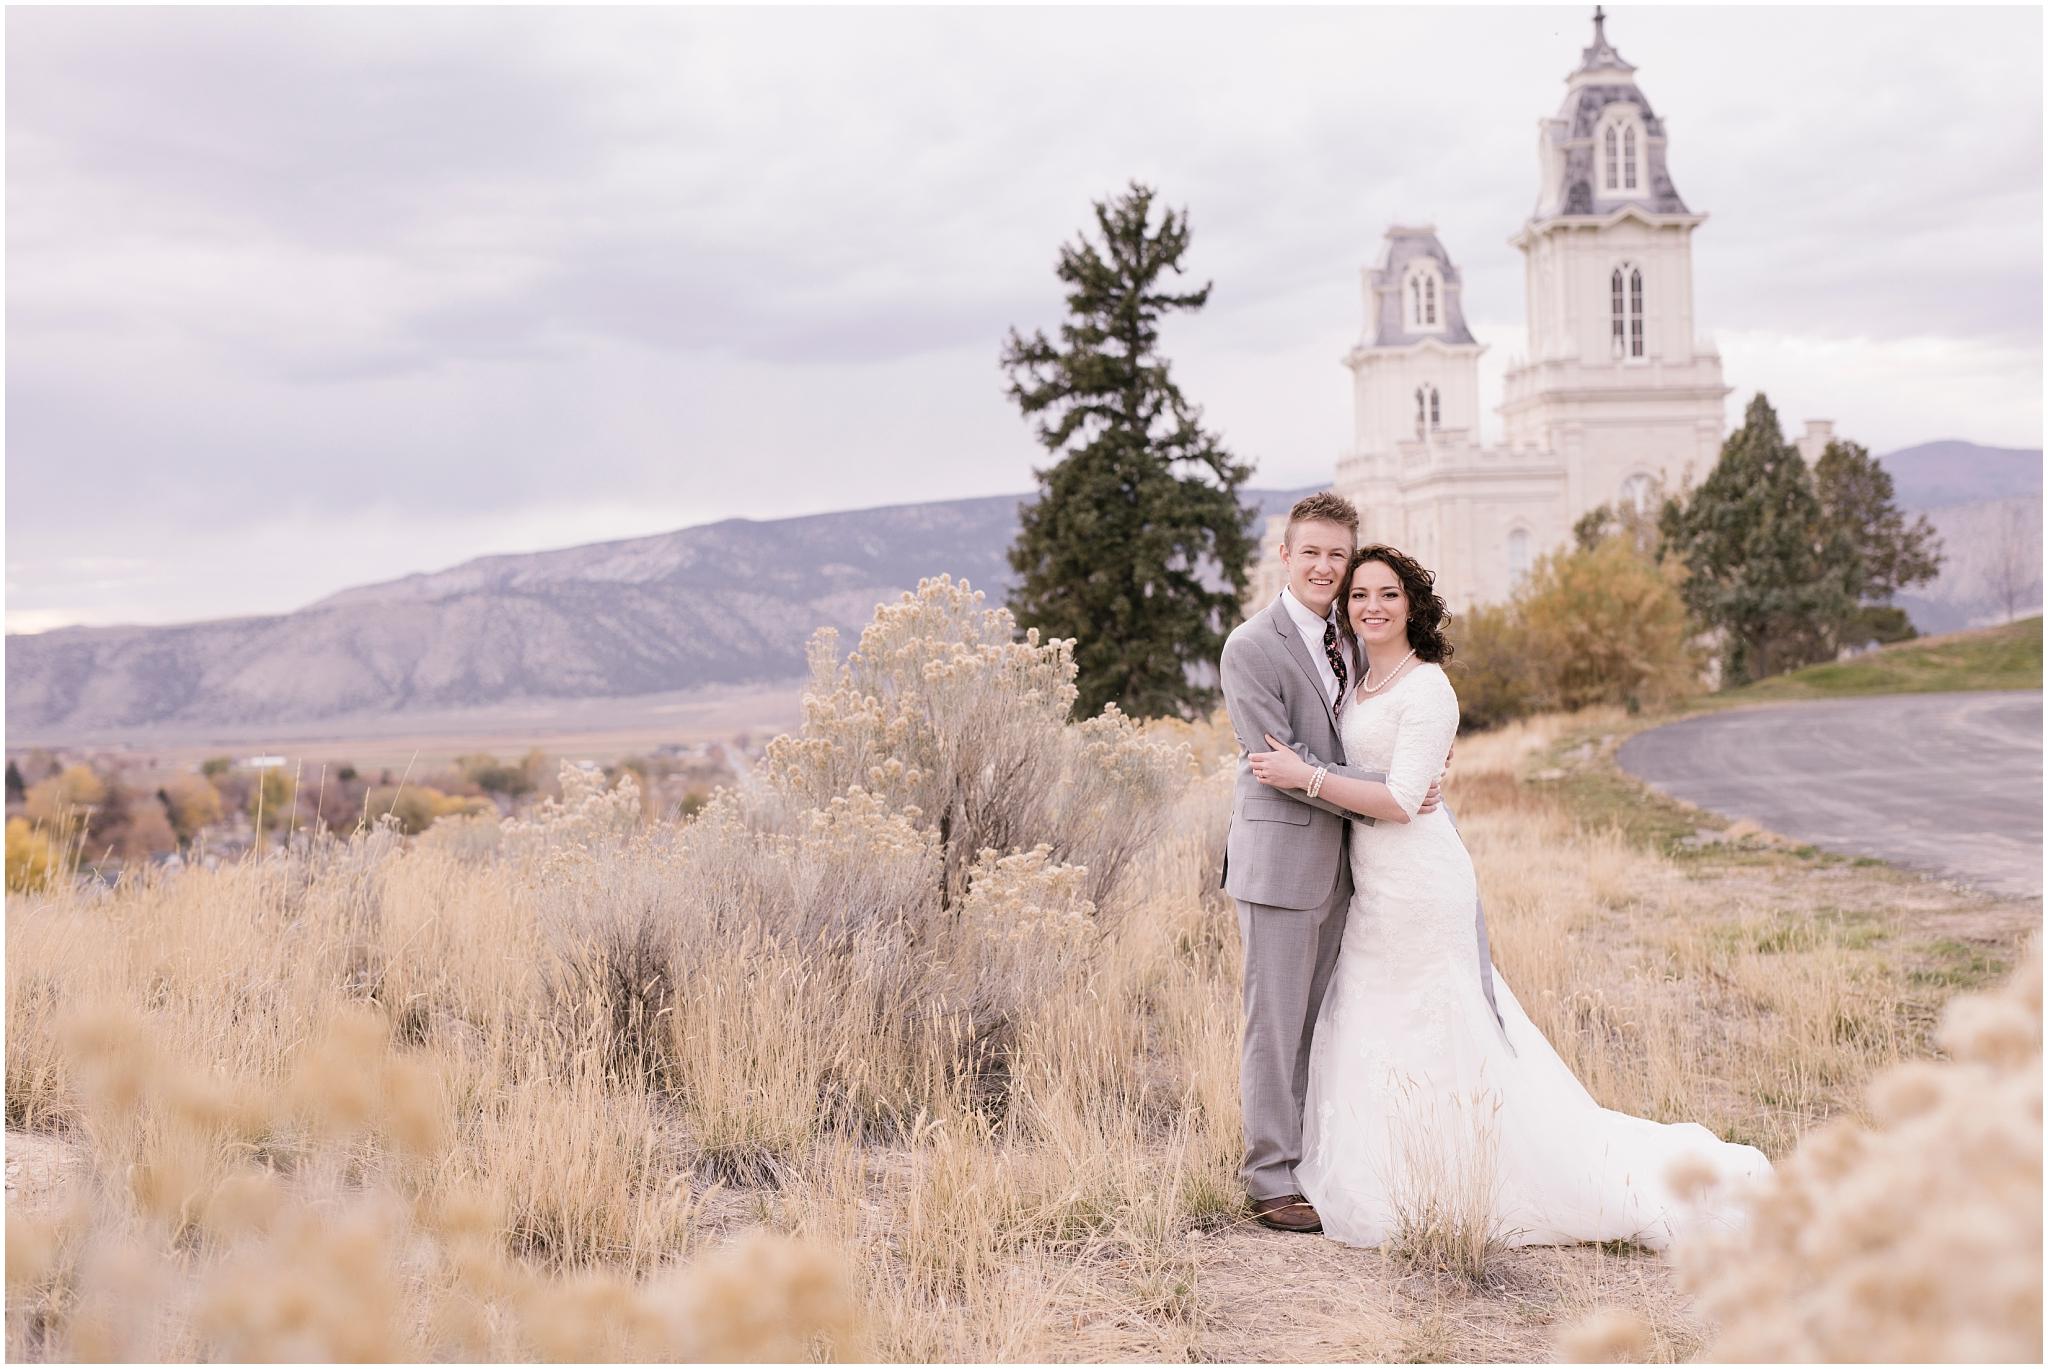 BA-Bridals-60_Lizzie-B-Imagery-Utah-Wedding-Photographer-Central-Utah-Photographer-Utah-County-Manti-Utah-Temple.jpg